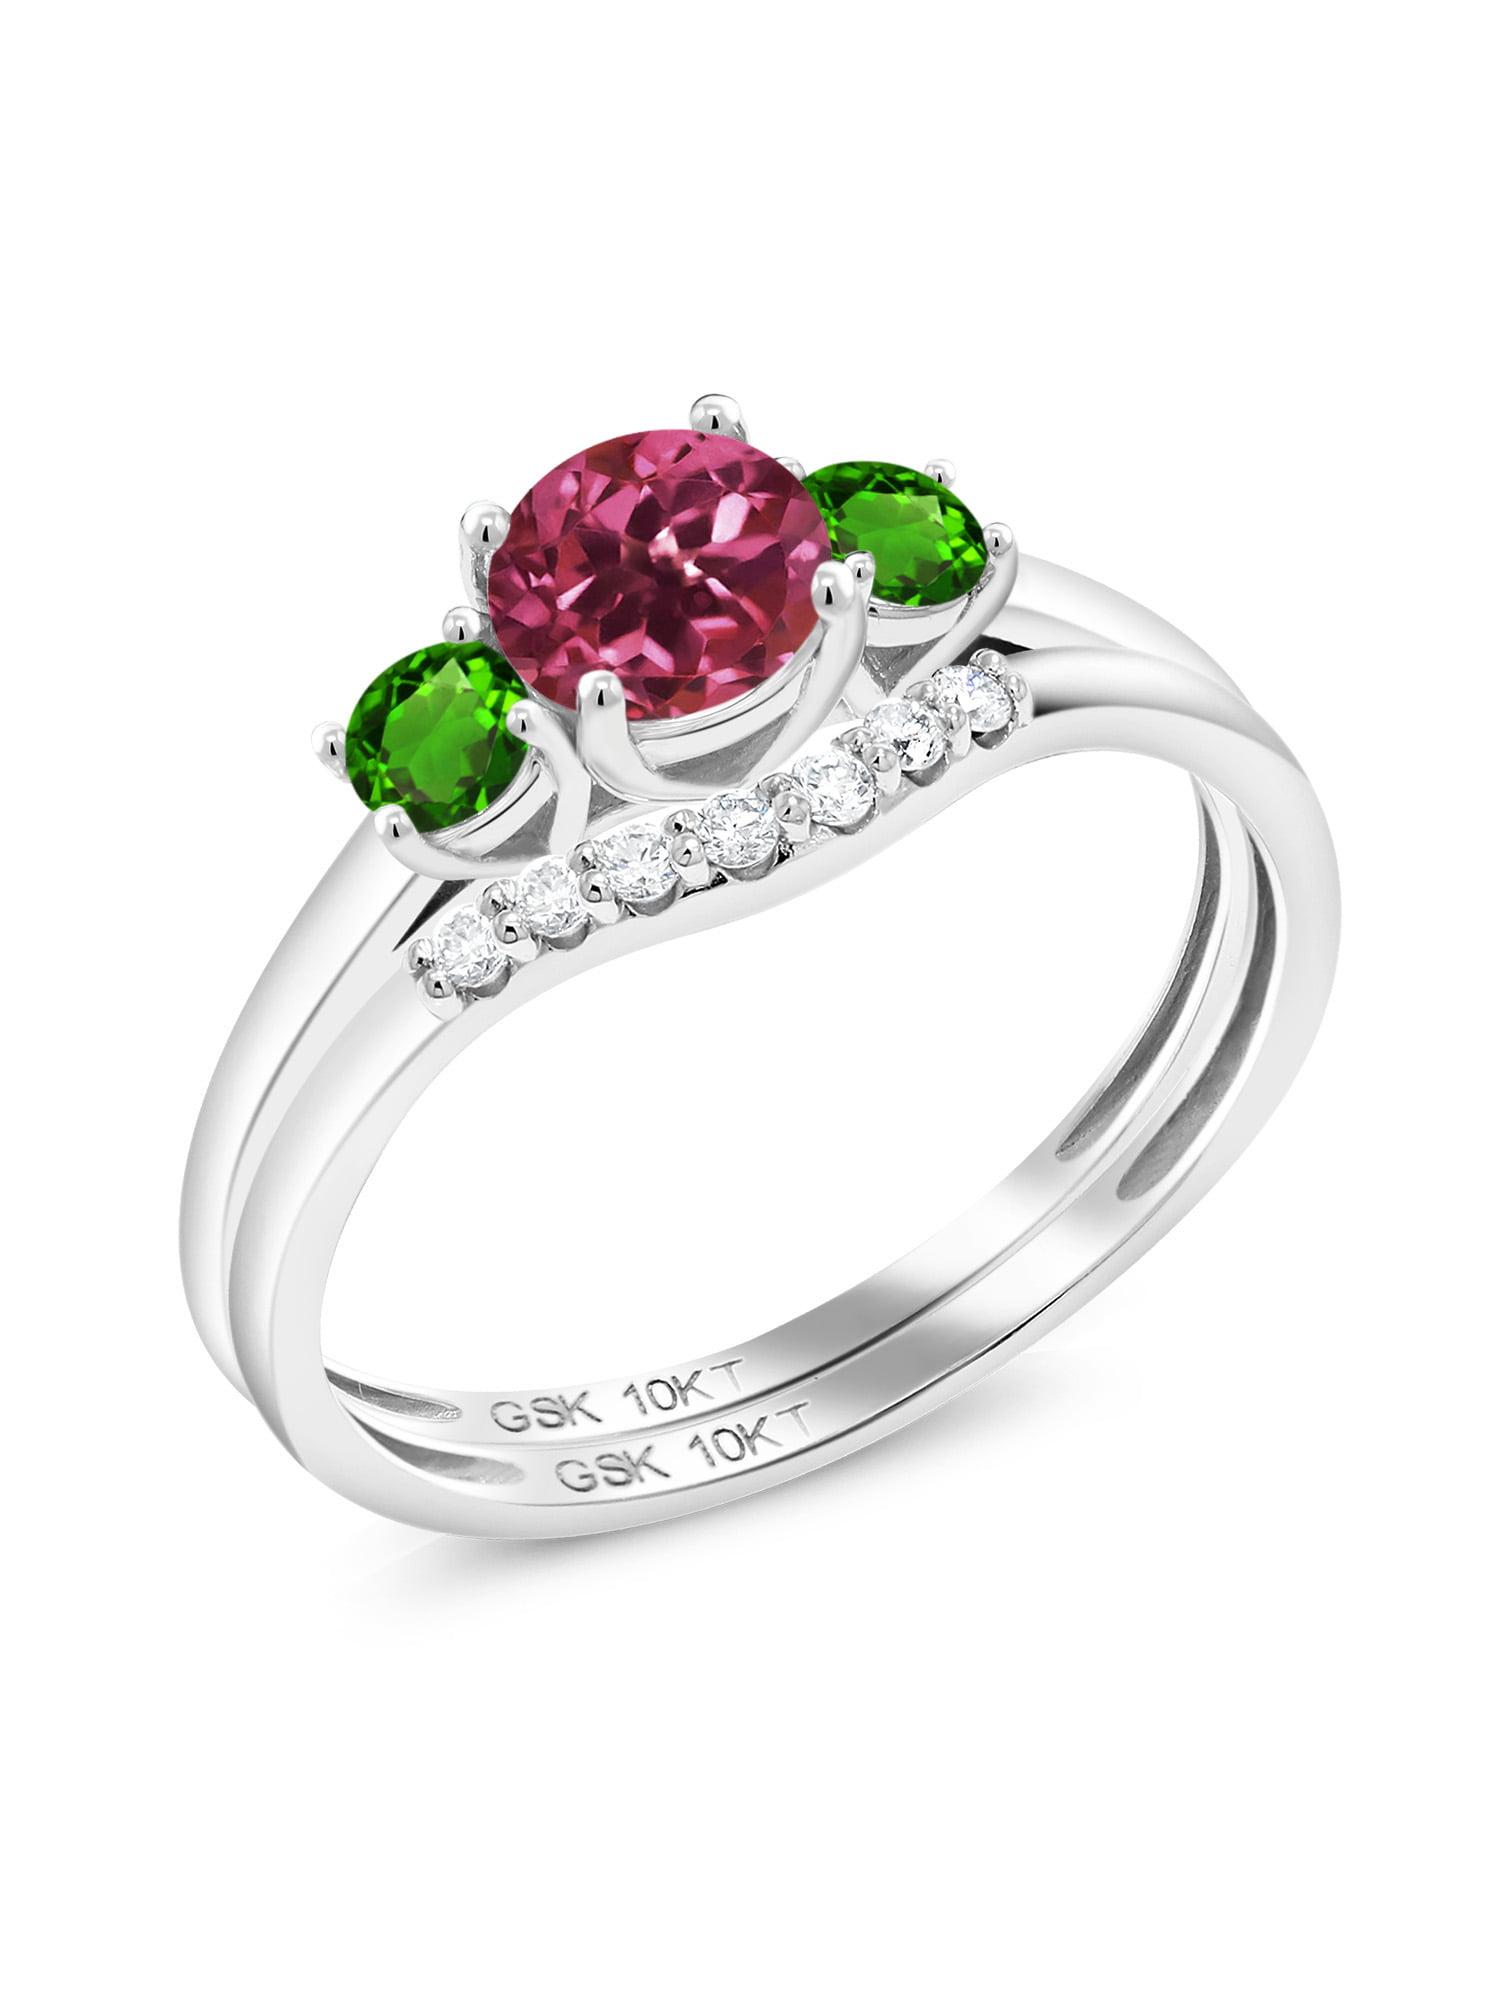 0.85 Ct Round Pink Tourmaline Green Simulated Tsavorite 10K White Gold Lab Grown Diamond Ring by